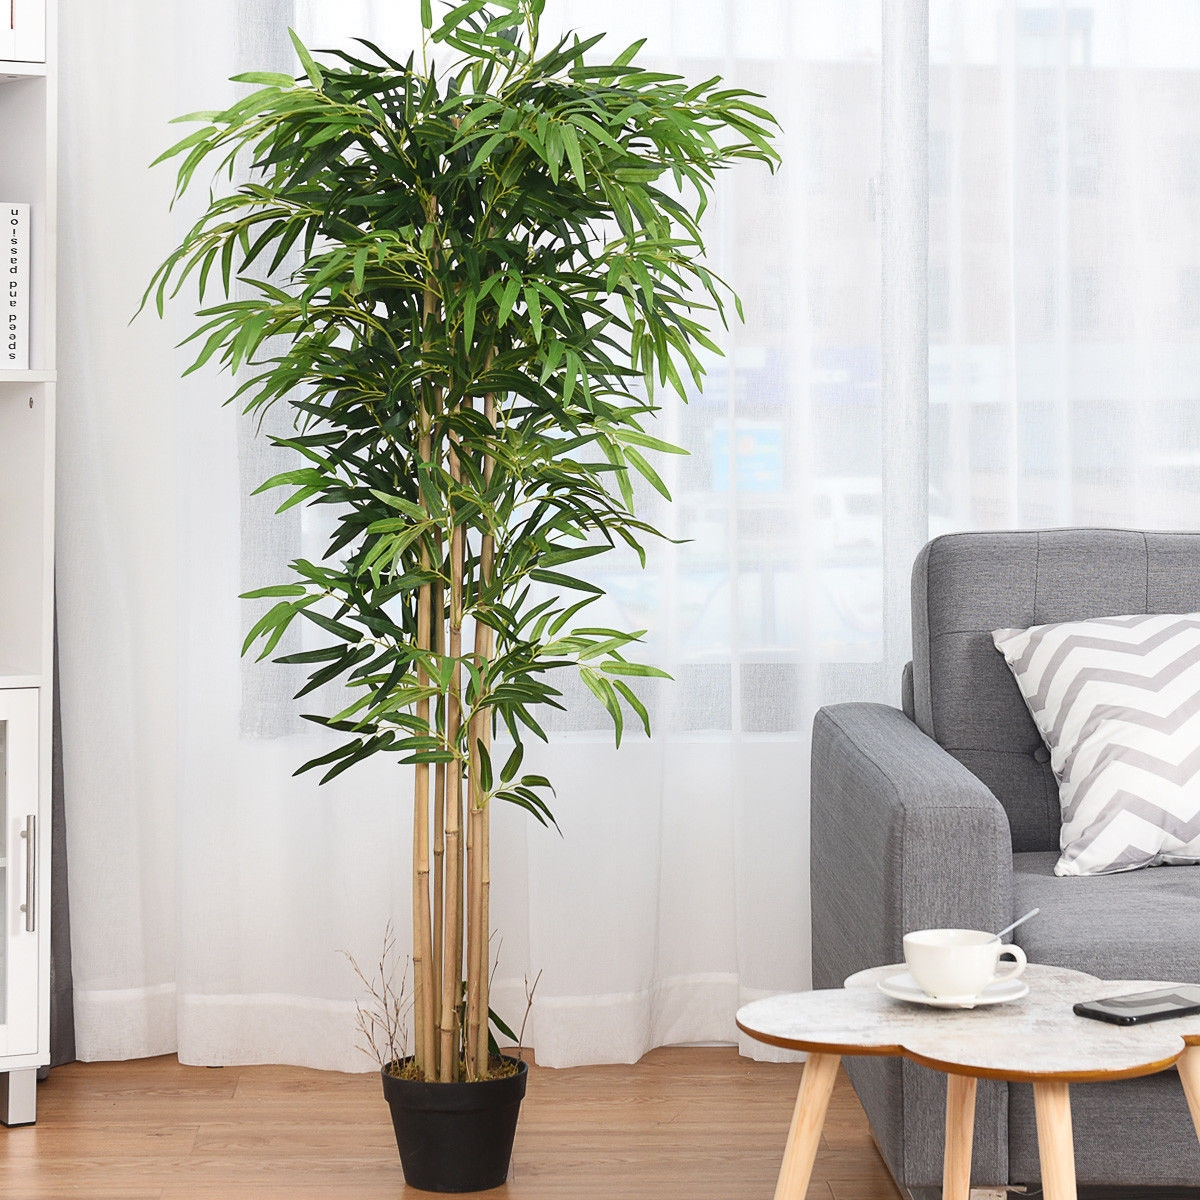 Image of 5-Feet Artificial Bamboo Silk Tree Indoor-Outdoor Decorative Planter